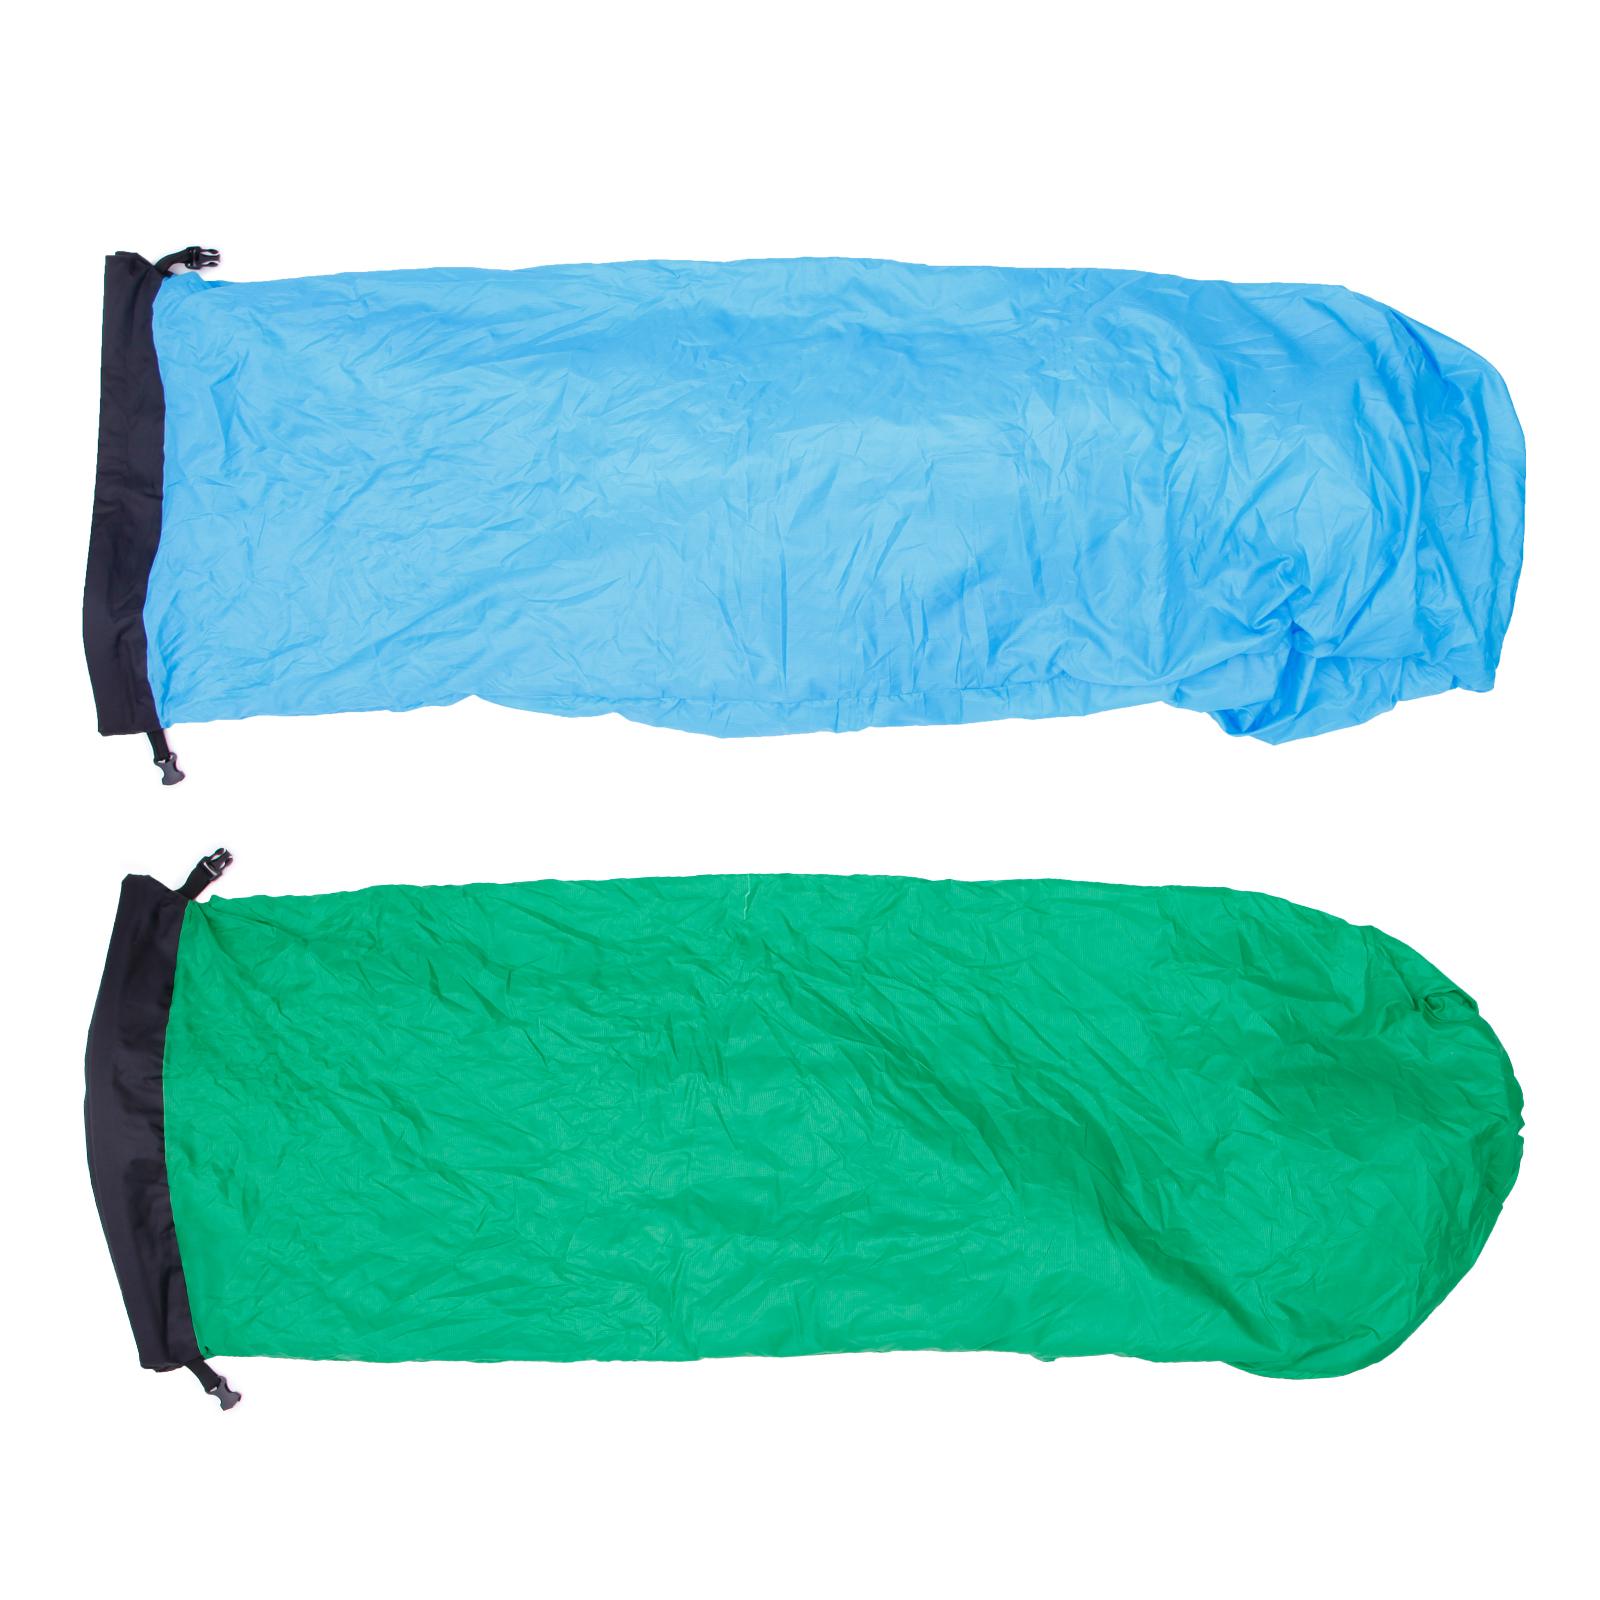 Tumbona hinchable silla cama sof inflable para piscina for Sofa cama inflable